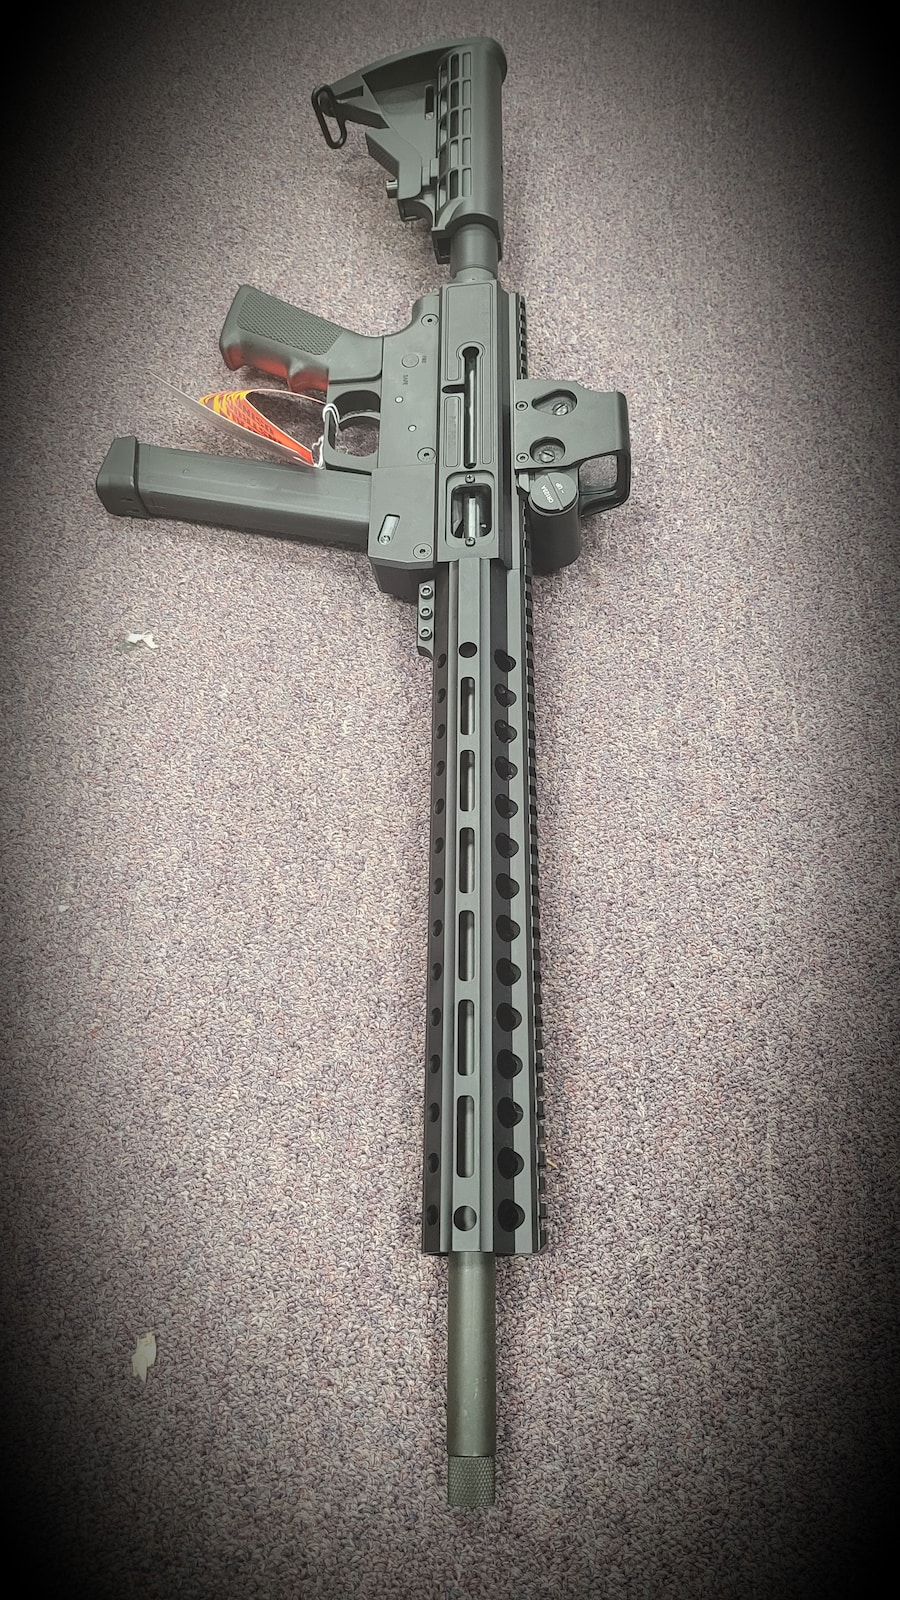 JUST RIGHT CARBINE 10rd magazine Just Right Carbine Gen 3 9mm MLok Rail